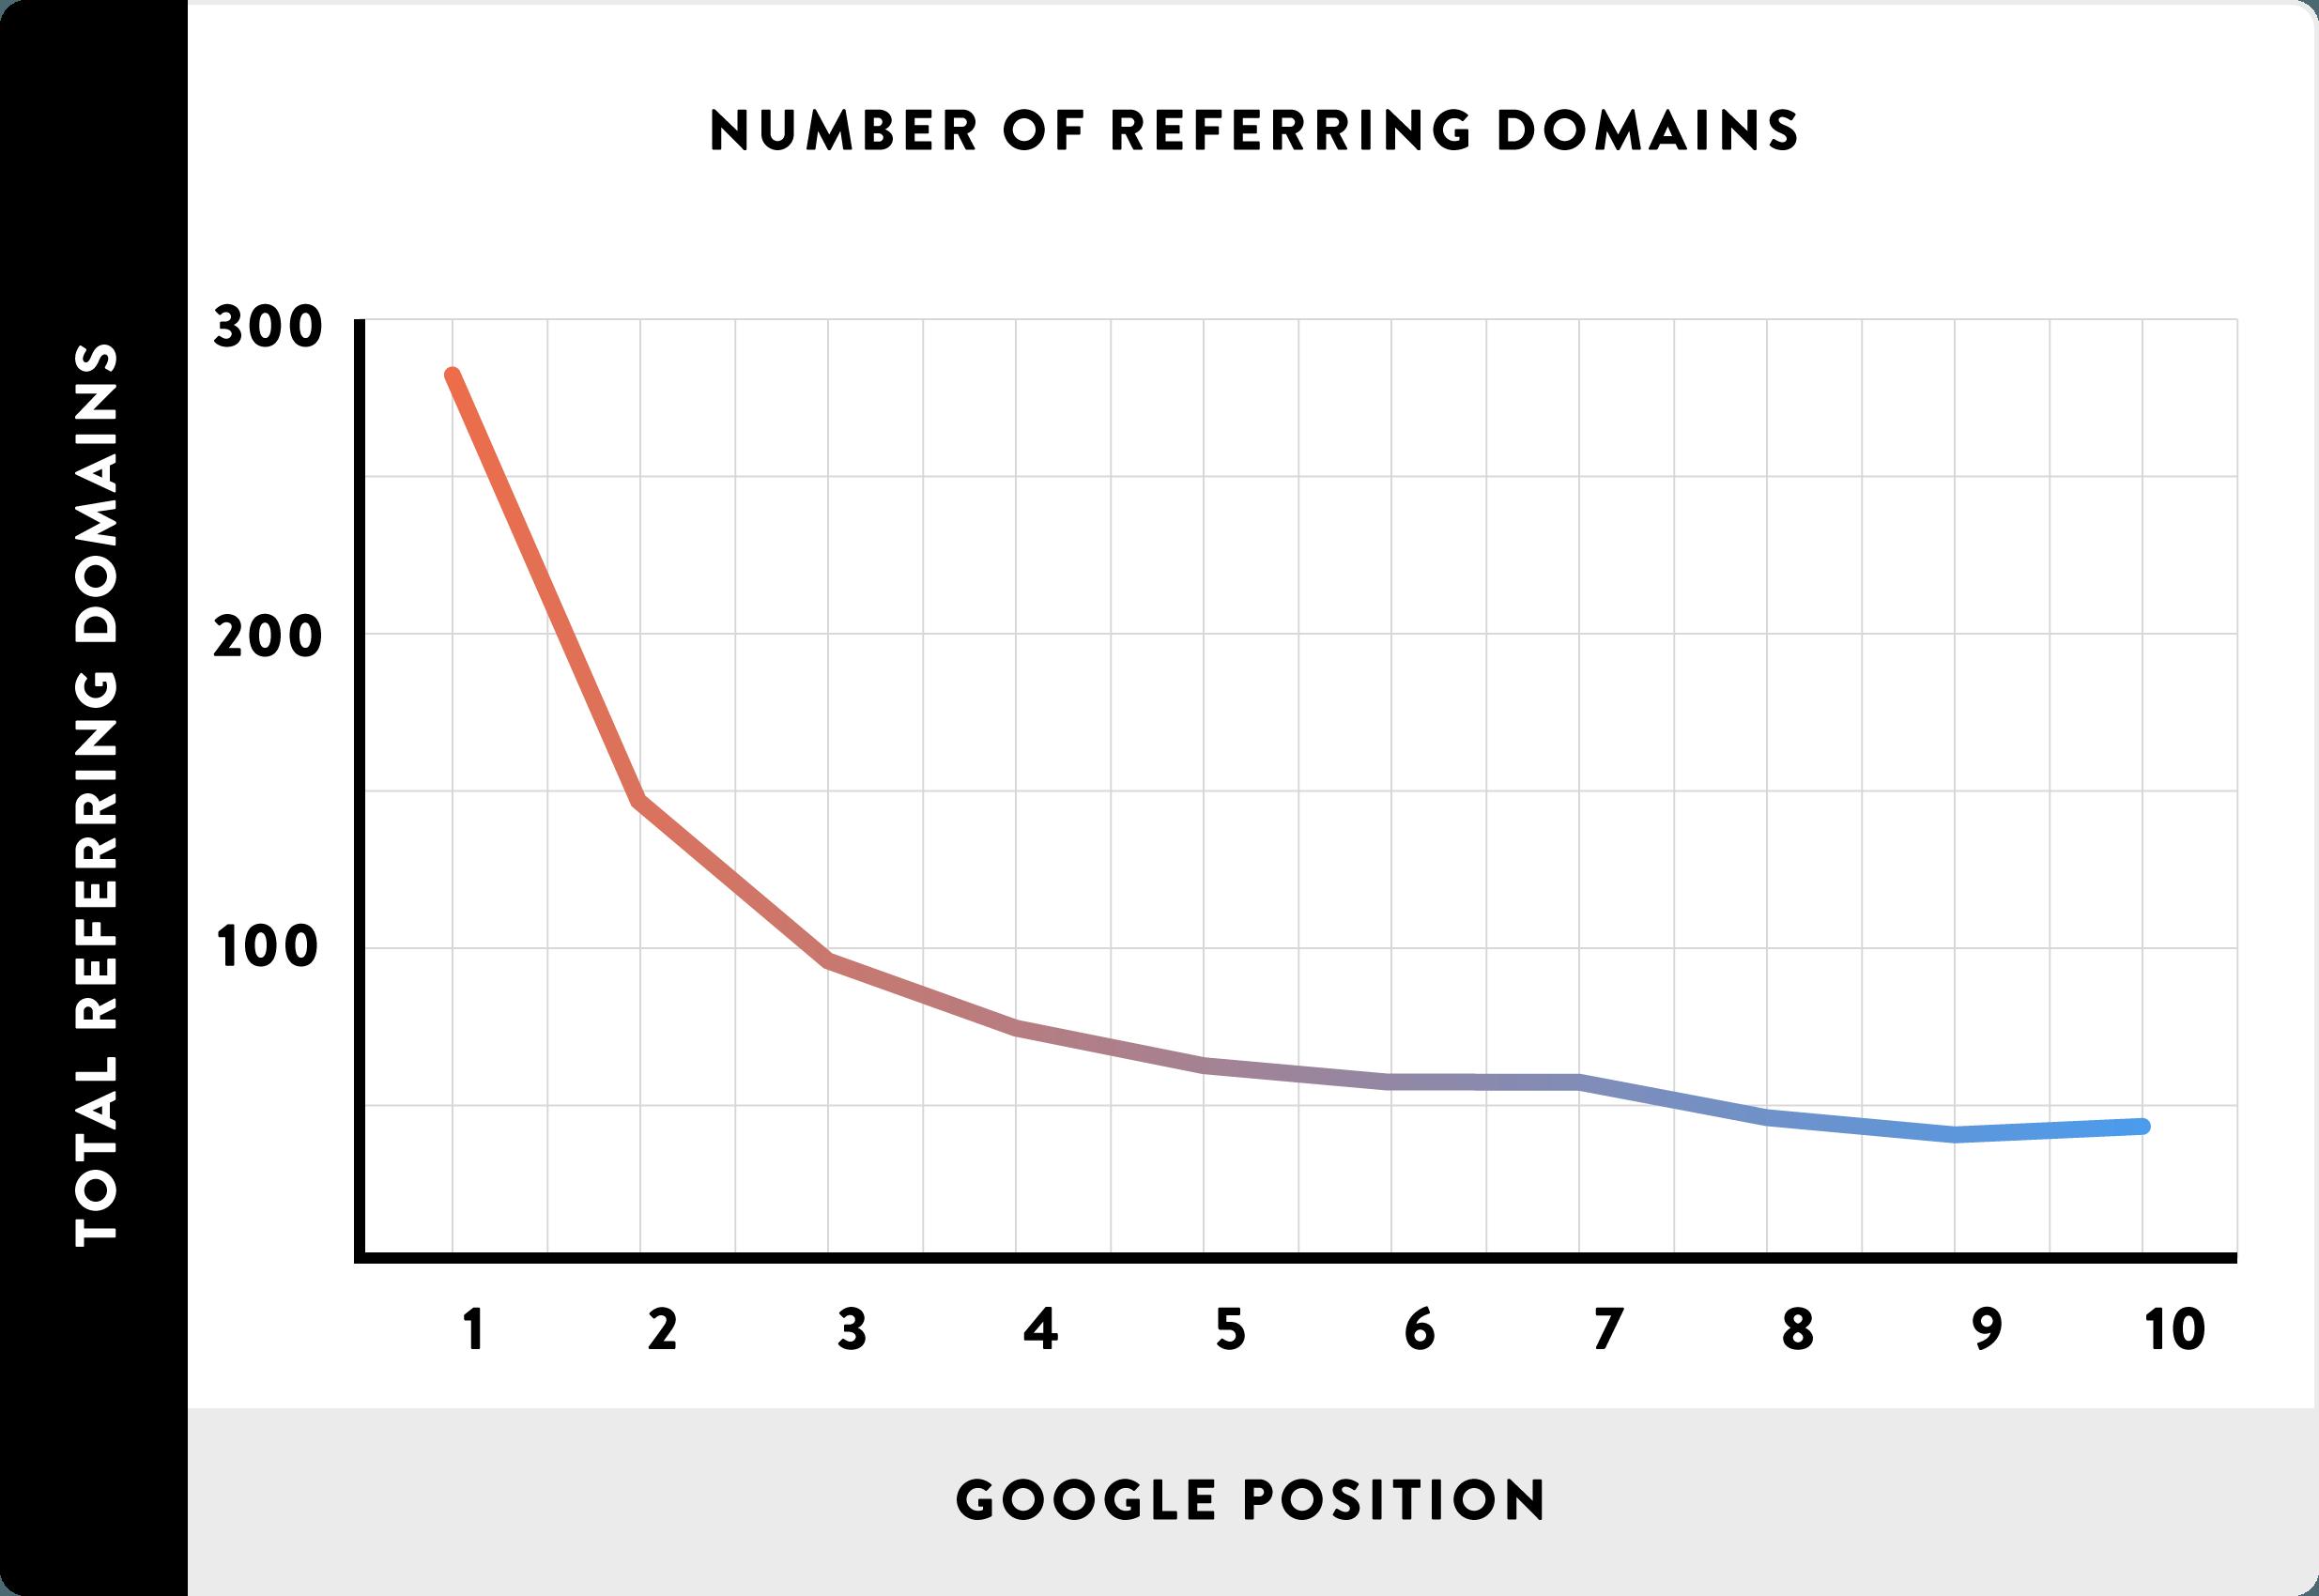 Verweisende Domains